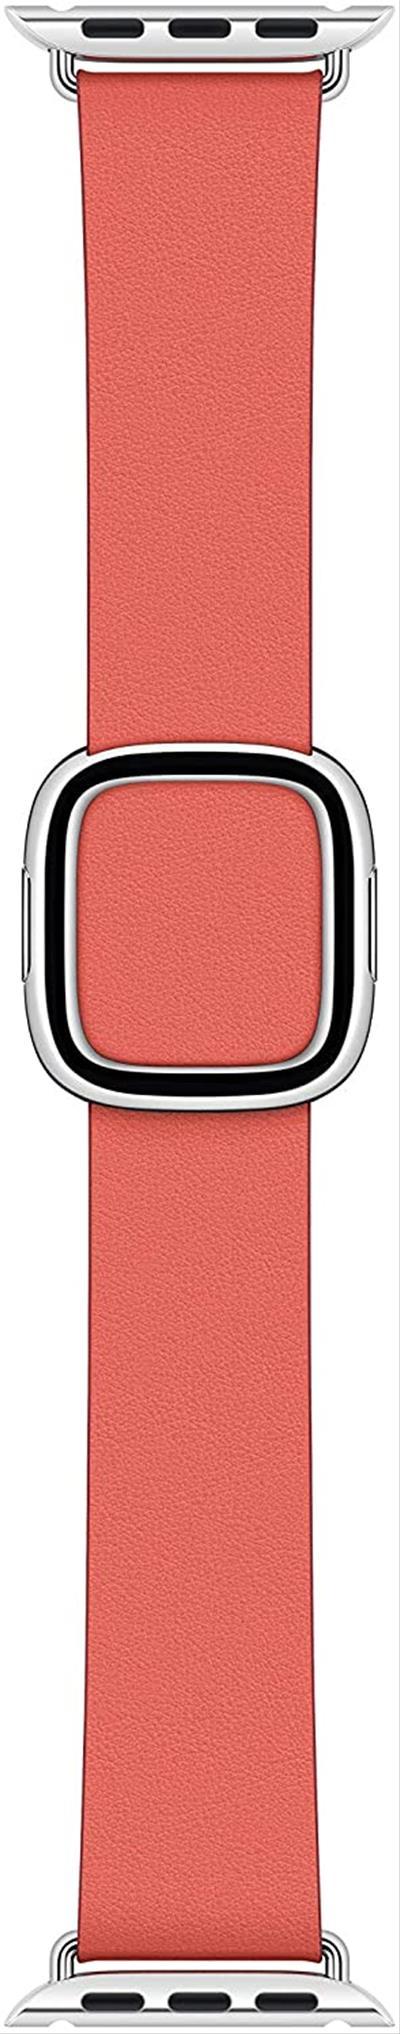 Correa Apple Watch 40mm S rosa pomelo